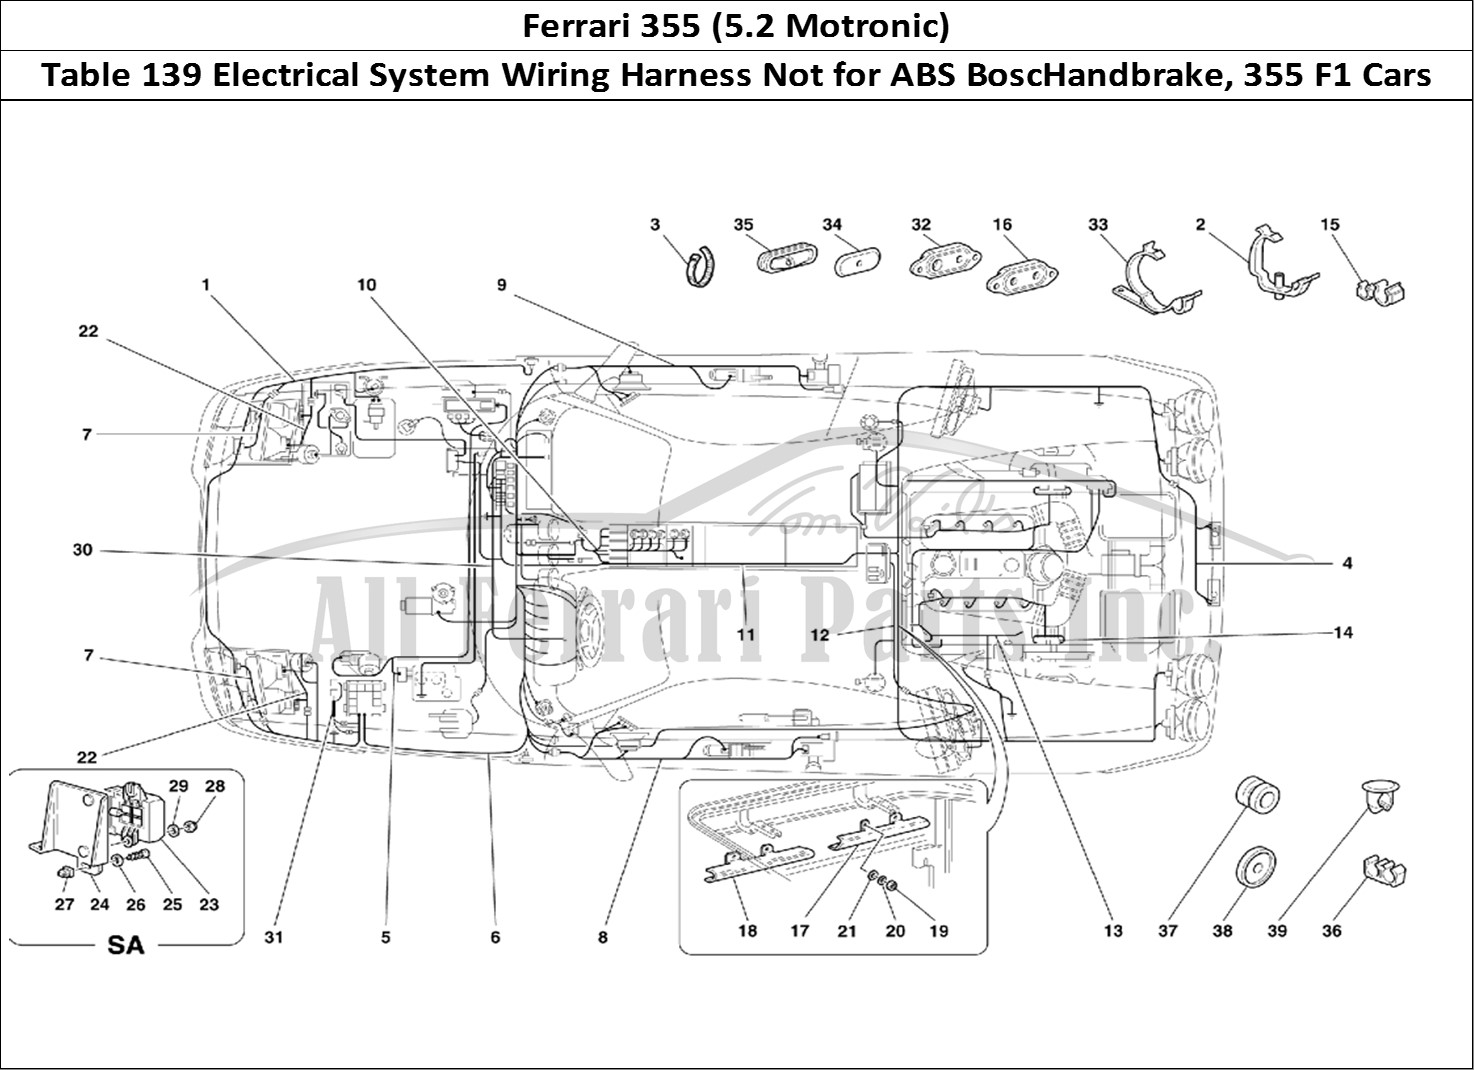 hight resolution of ferrari 355 5 2 motronic bodywork table 139 electrical system wiring harness not for abs boschandbrake 355 f1 cars